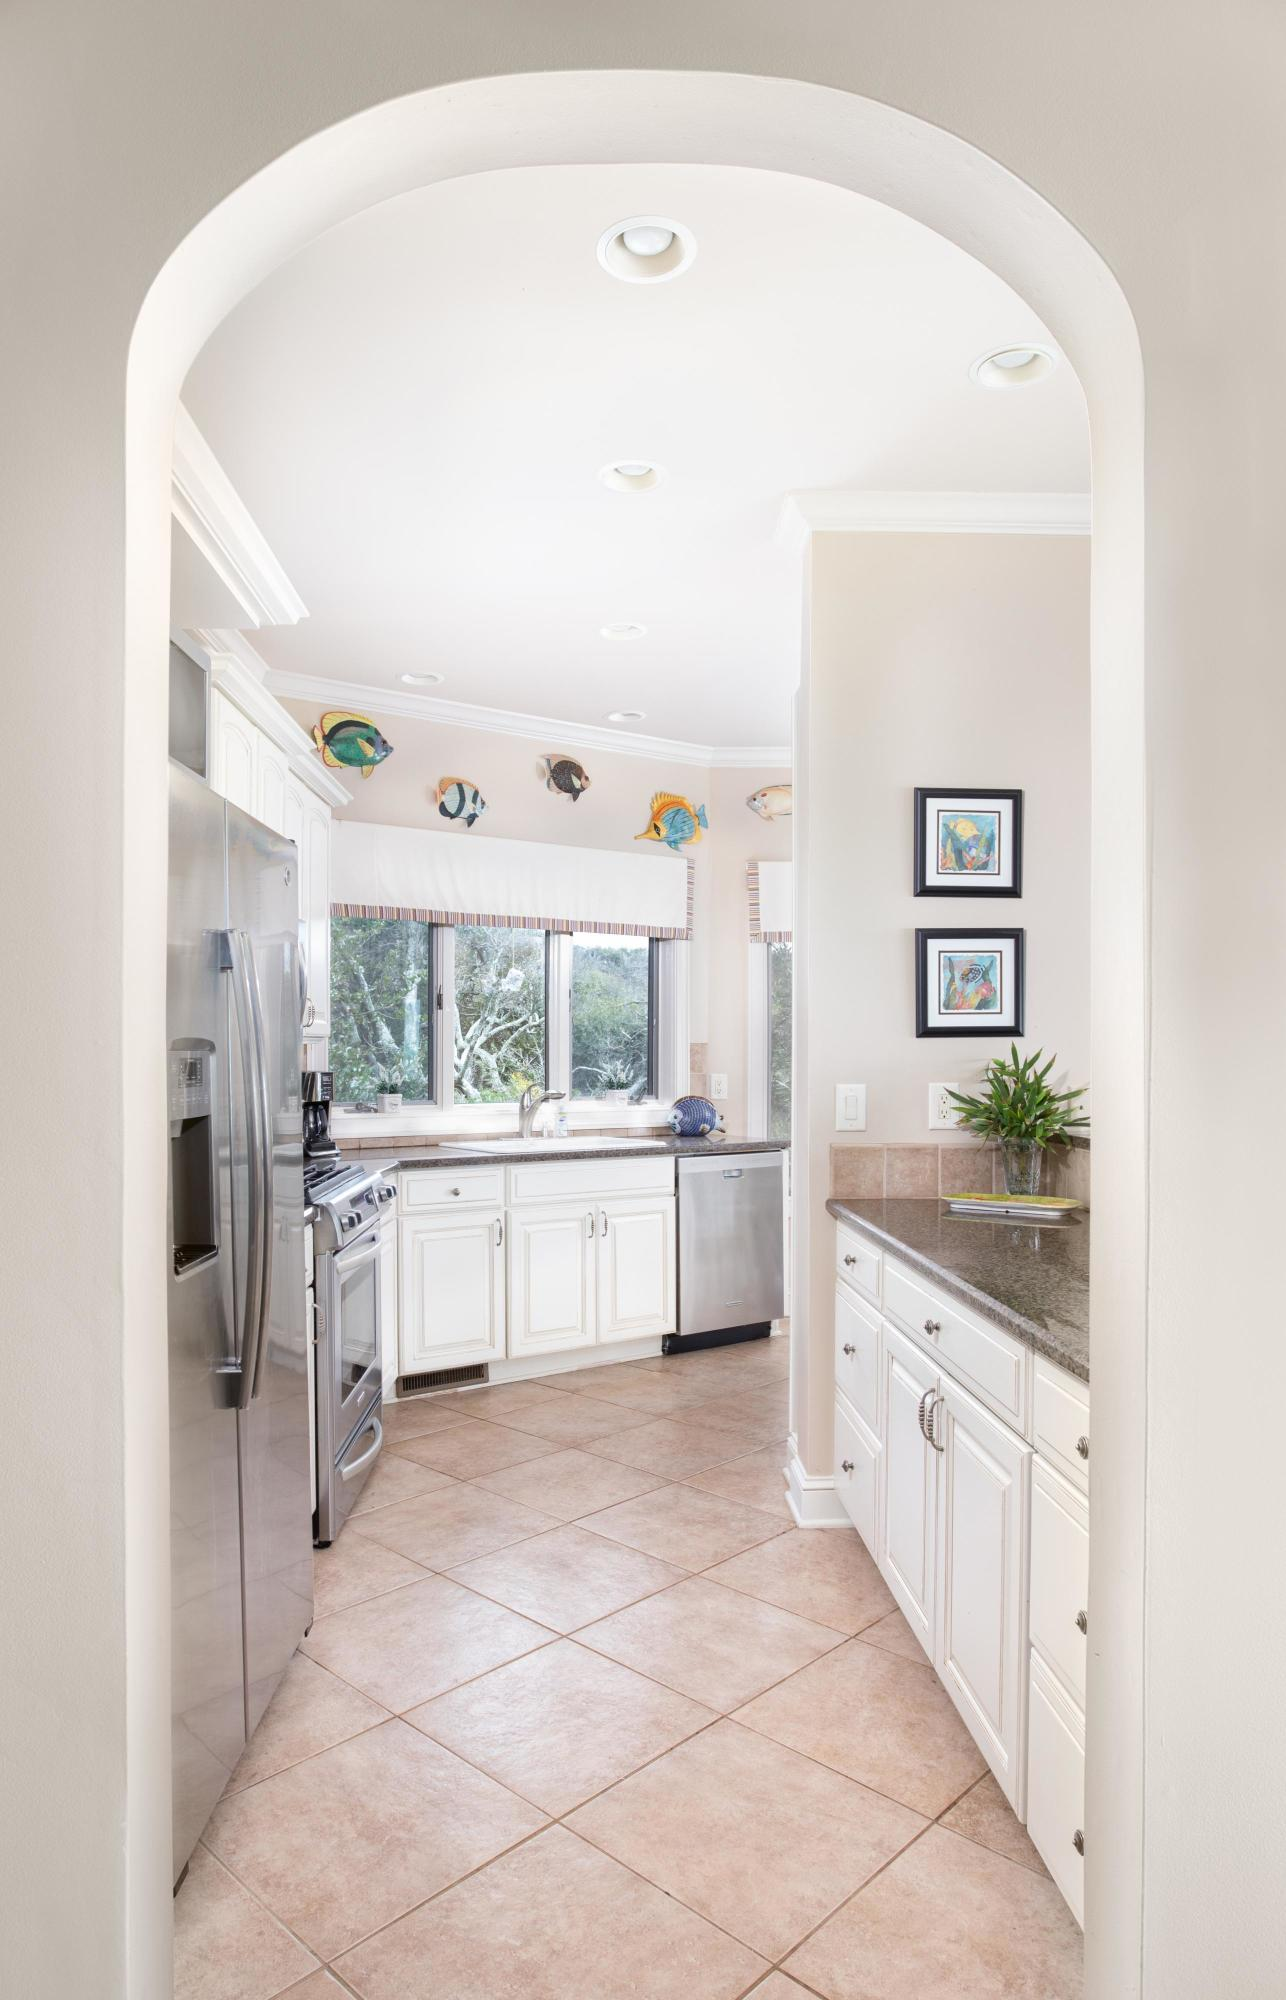 Kiawah Island Homes For Sale - 4200 Mariners Watch, Kiawah Island, SC - 36